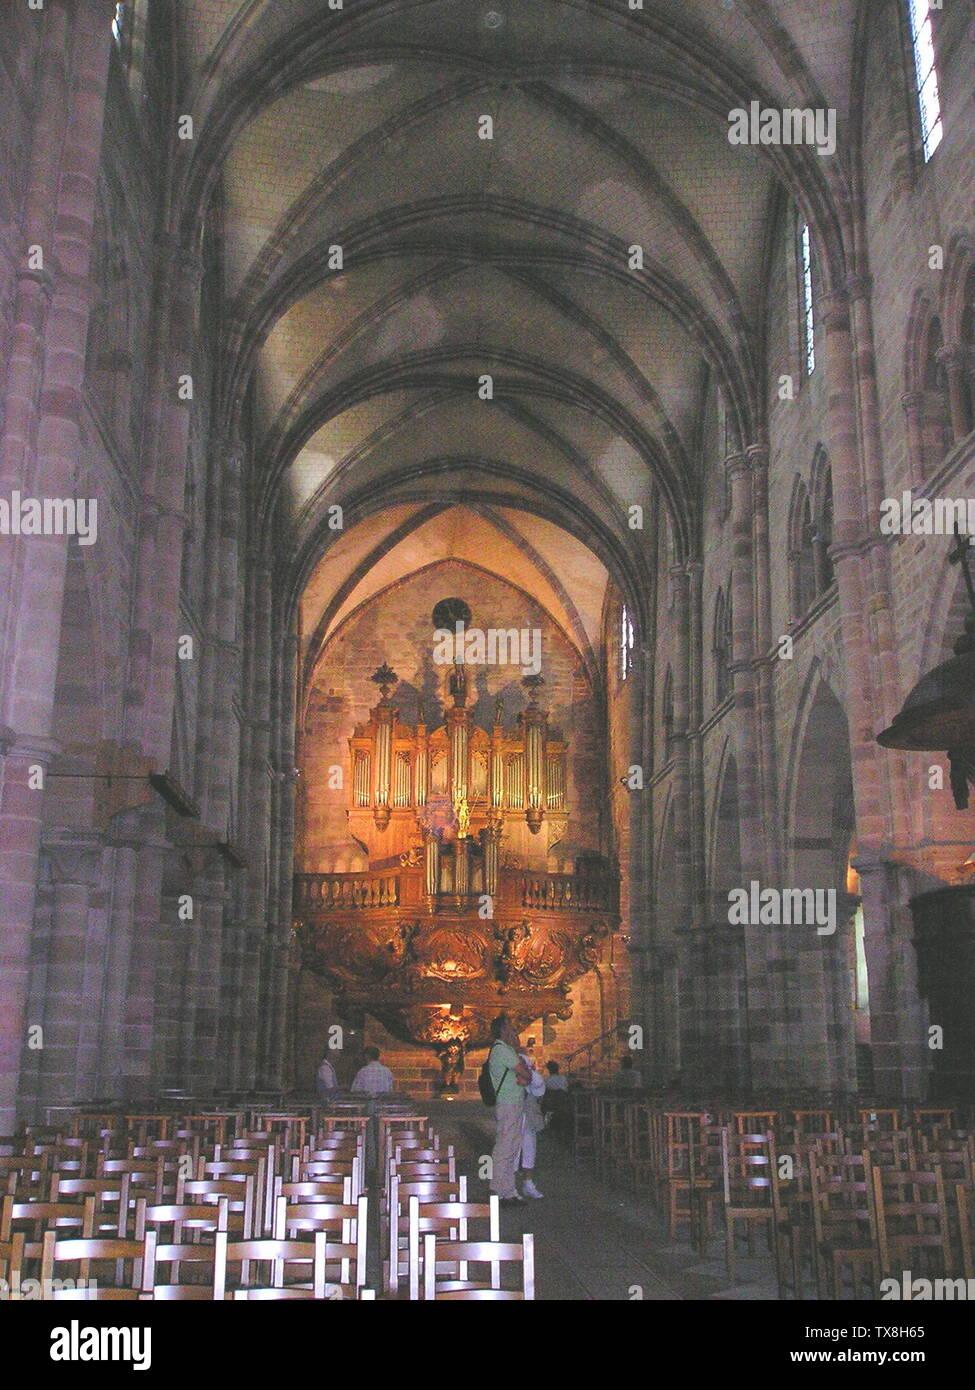 'Deutsch: Luxeuil-les-Bains,_St-Colomban, Inneres mit Orgelprospekt; August 2007; sekbst fotografiert; KBWEi at German Wikipedia; ' - Stock Image